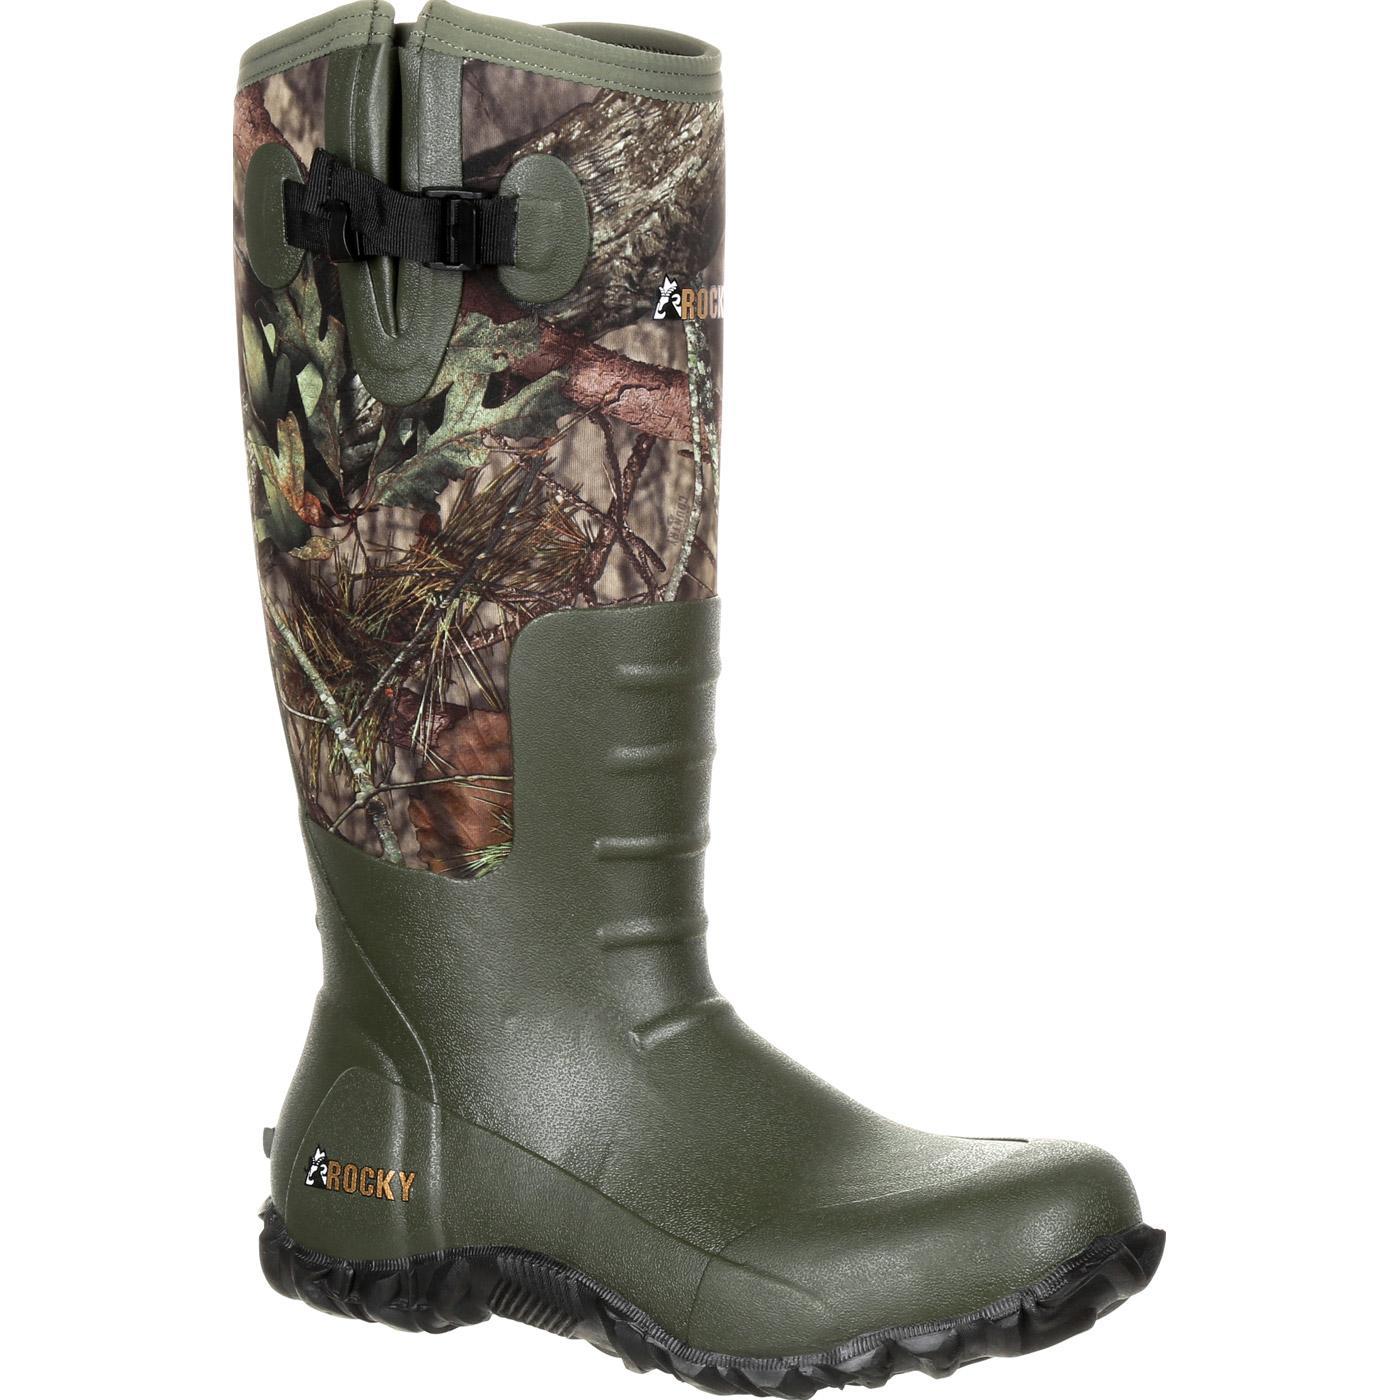 Rocky Core Rubber Waterproof Outdoor Boot Rks0350